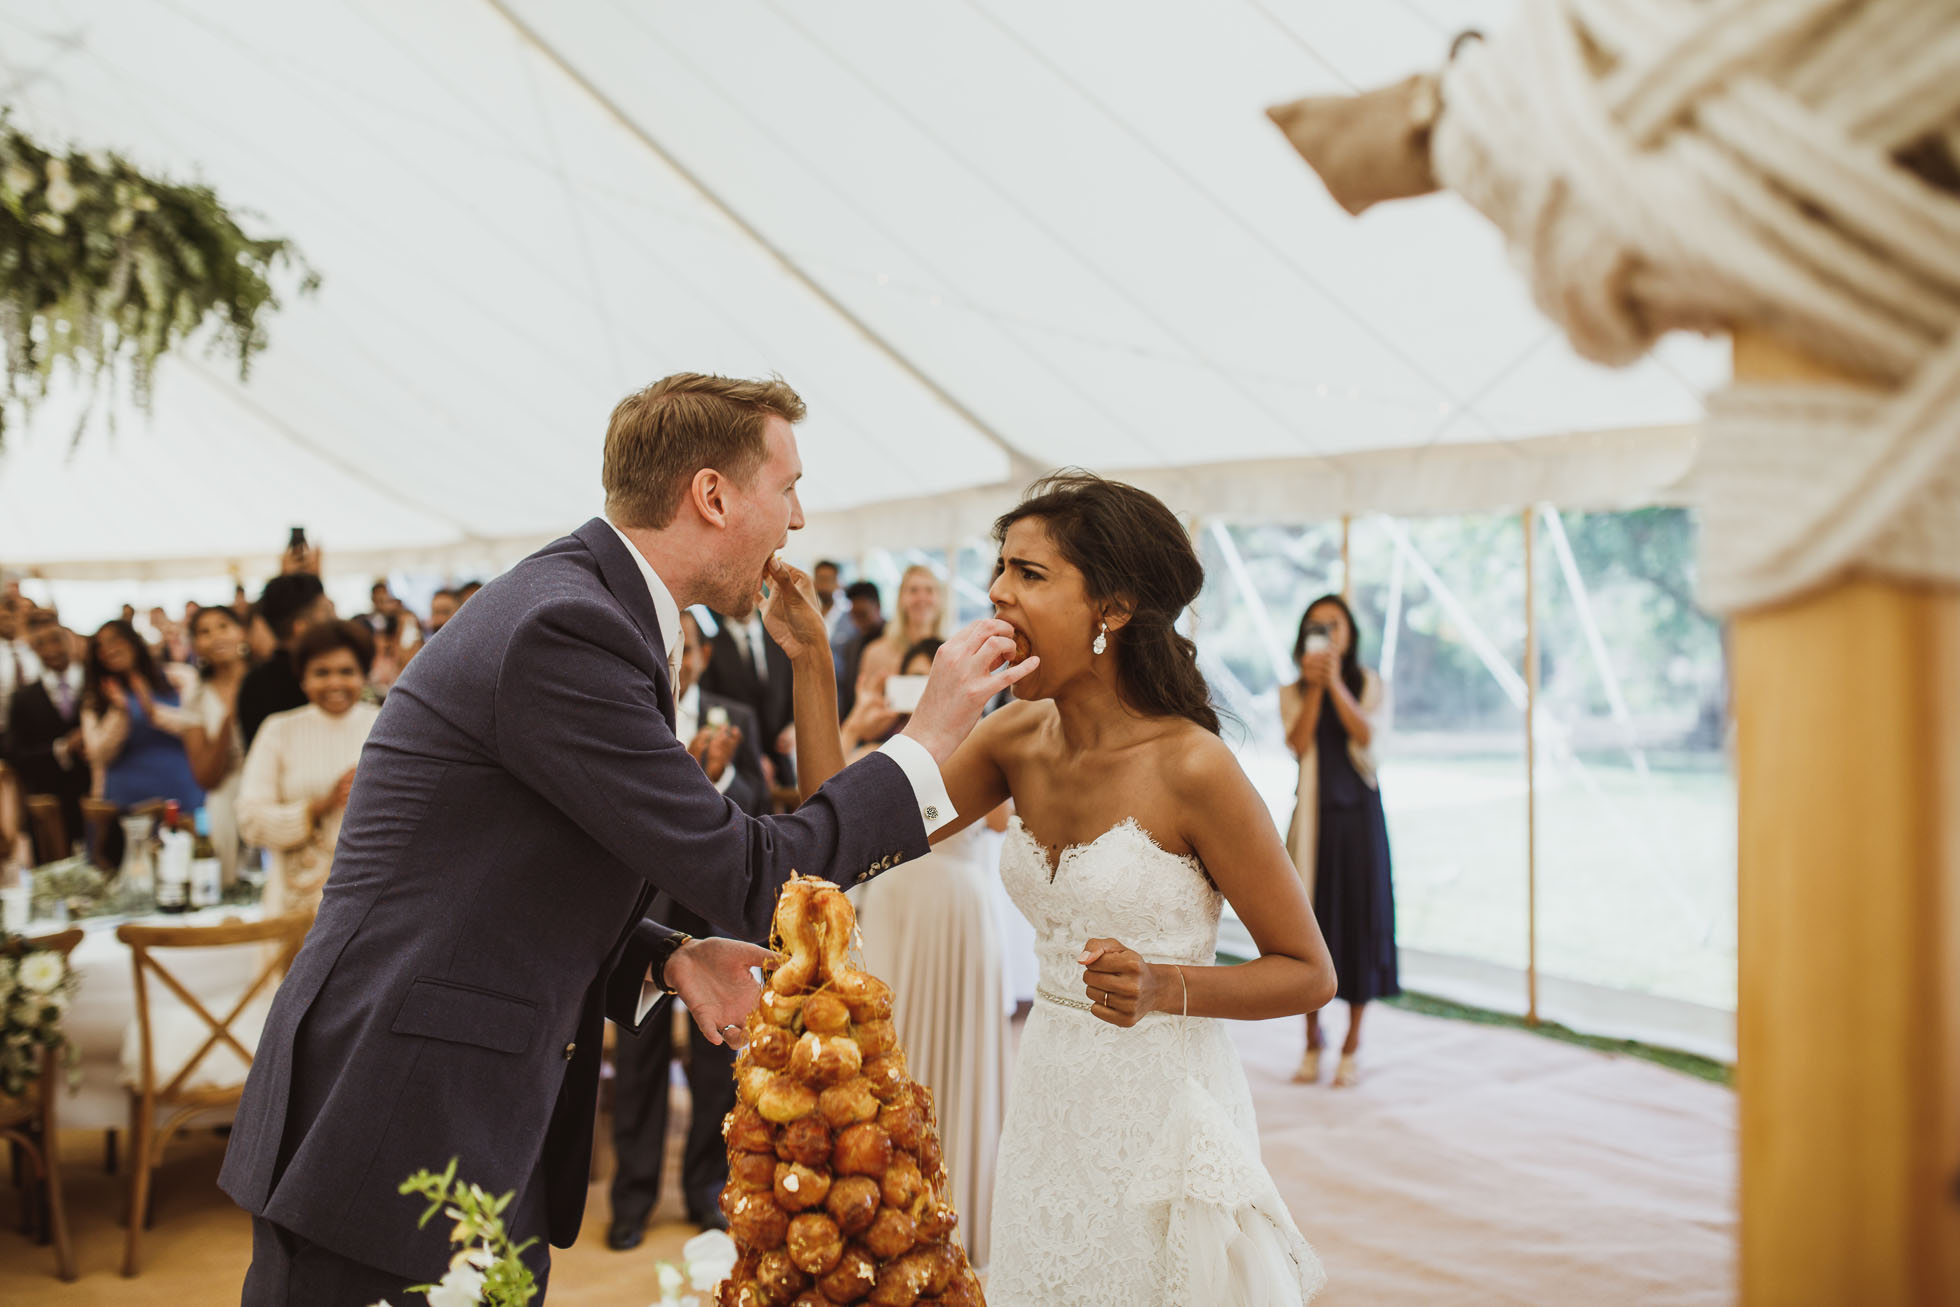 norton_conyers_wedding_photographer-60.jpg